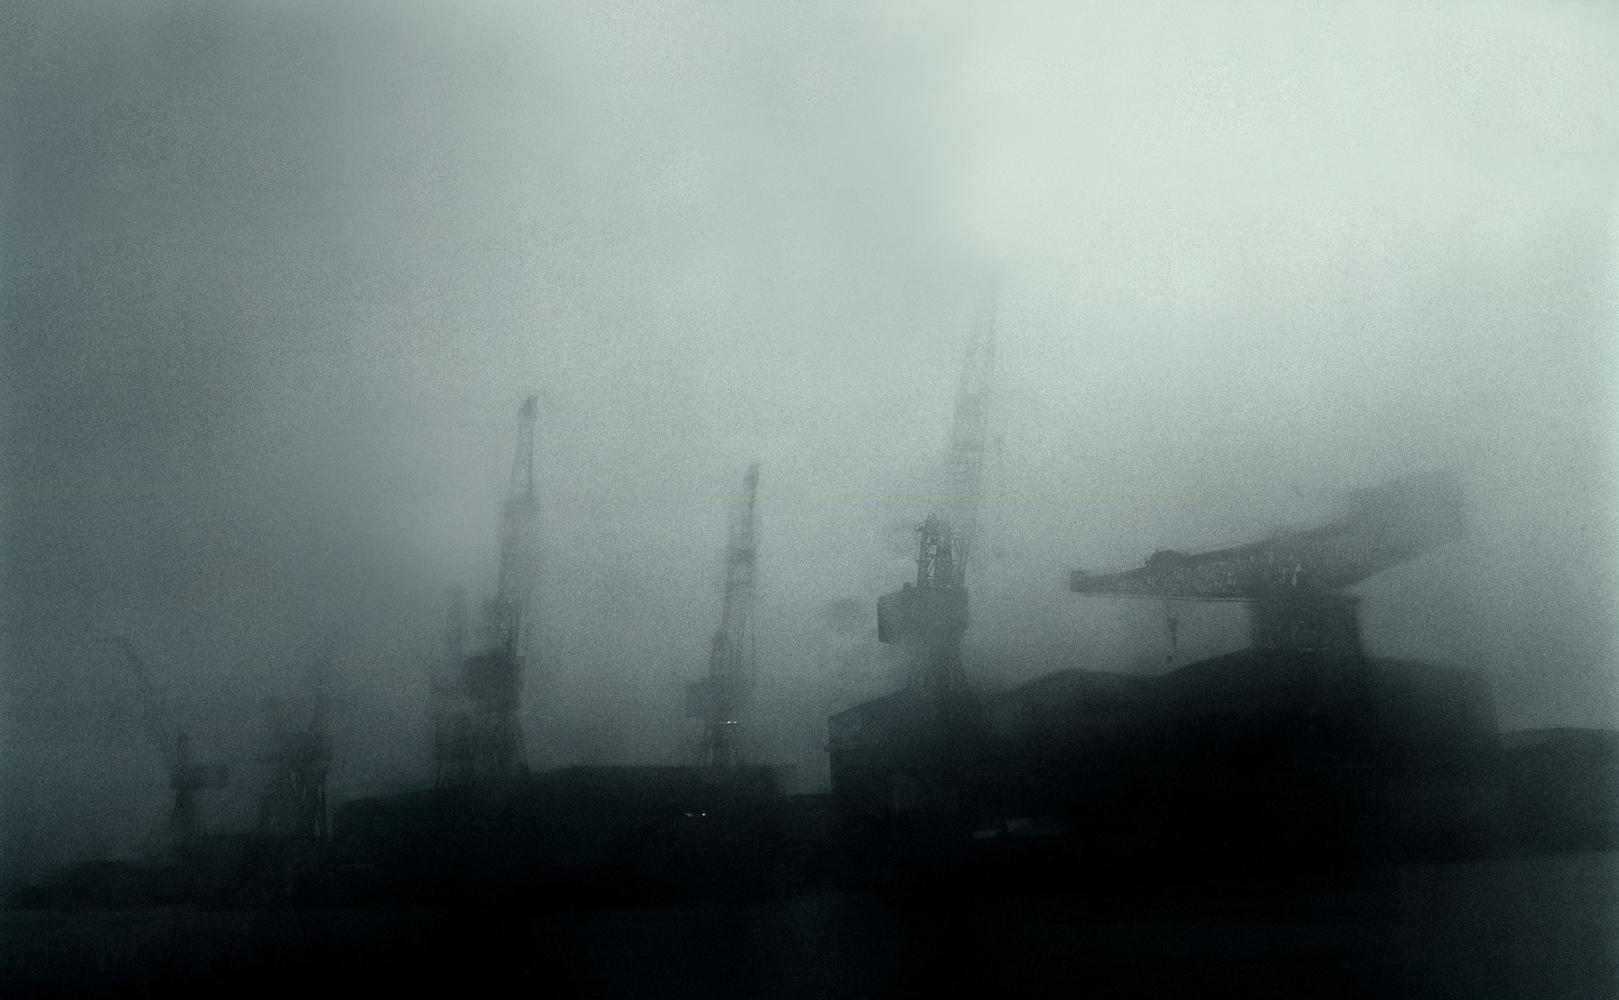 Scotland Cranes